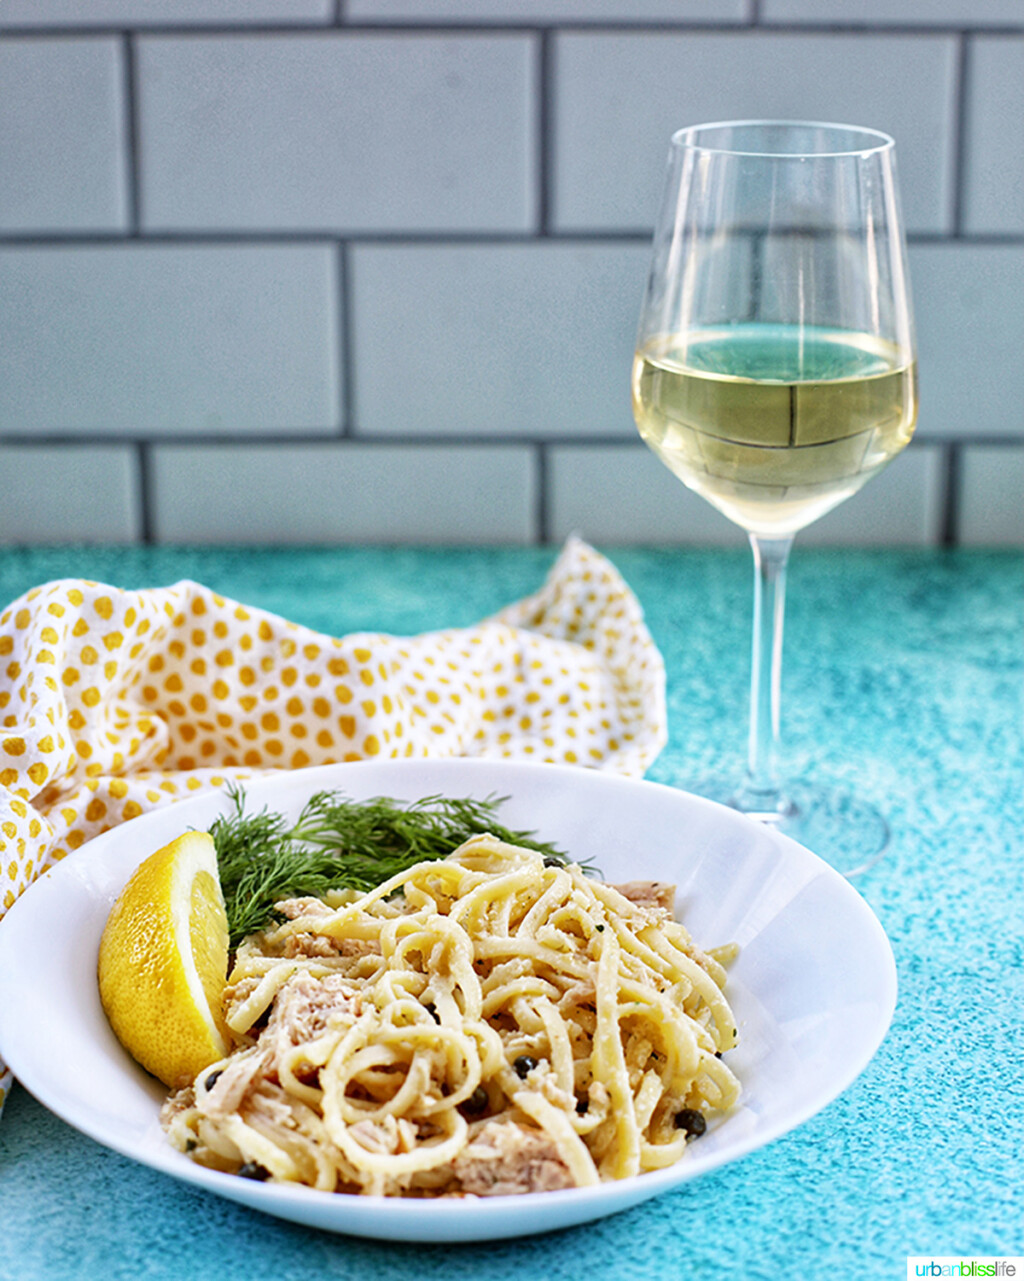 glass of white wine with bowl of tuna pasta